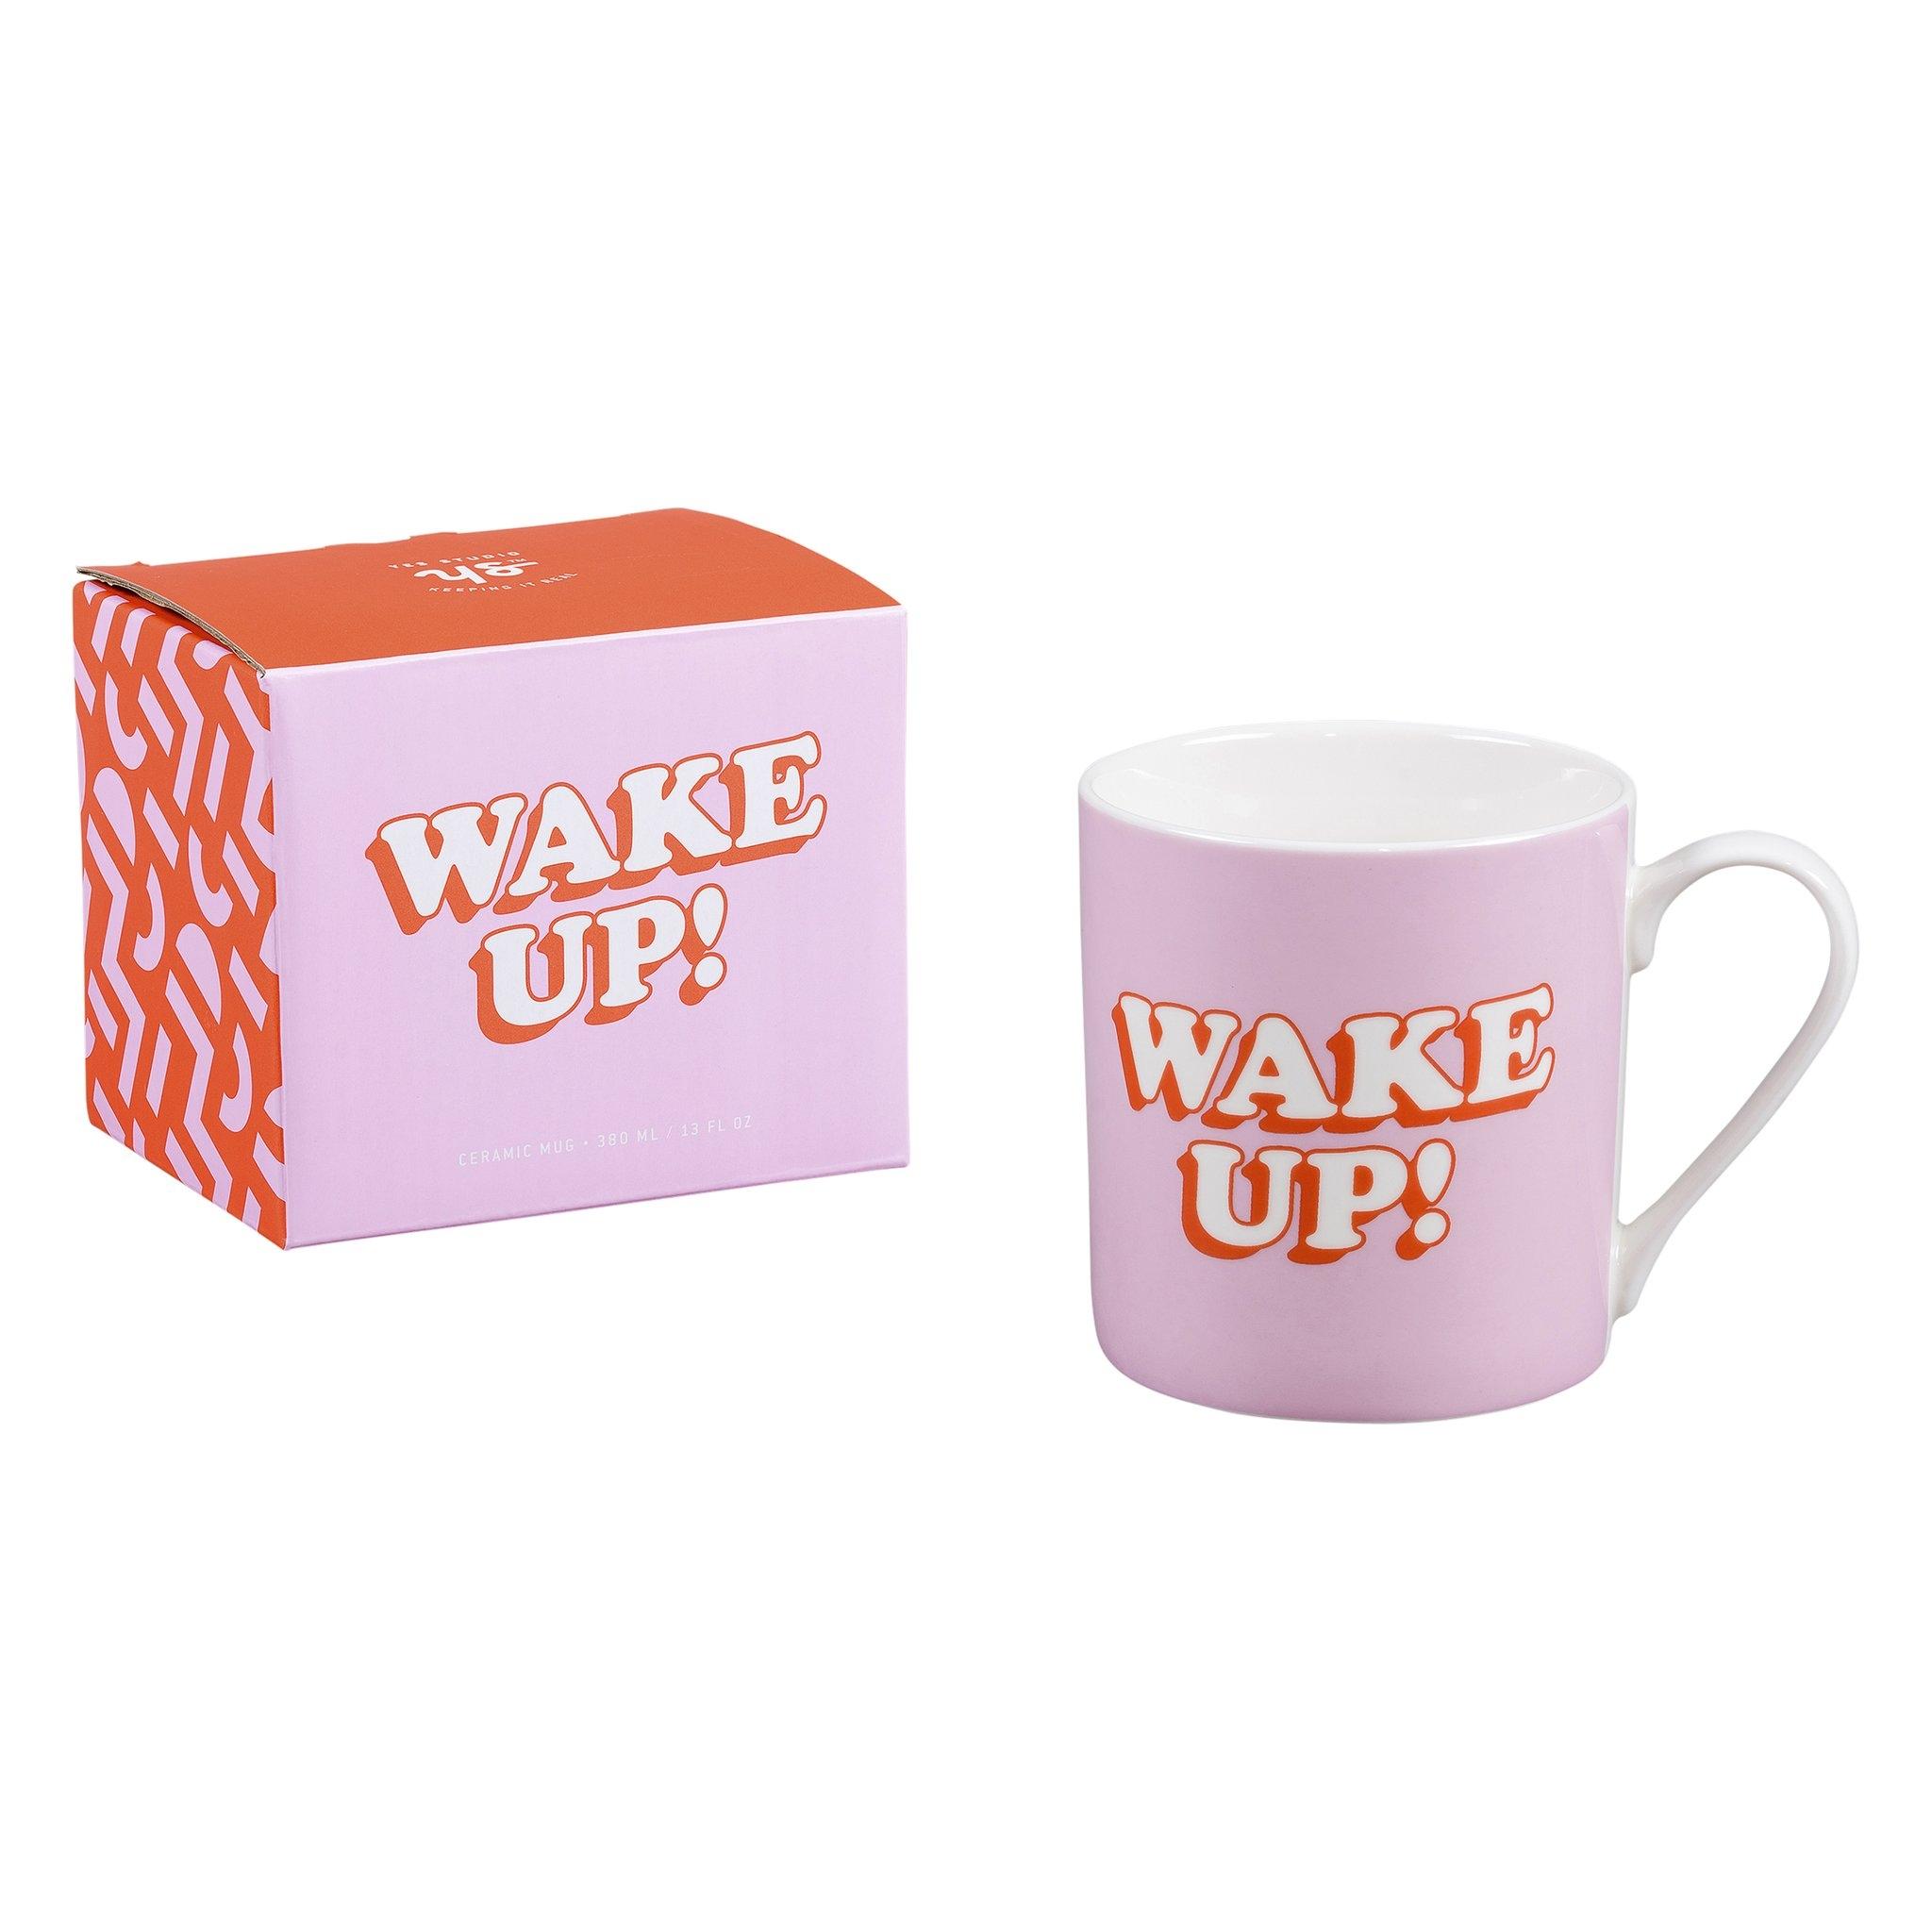 Cana ceramica Wake Up YST105, 380 ml, Wild & Wolf